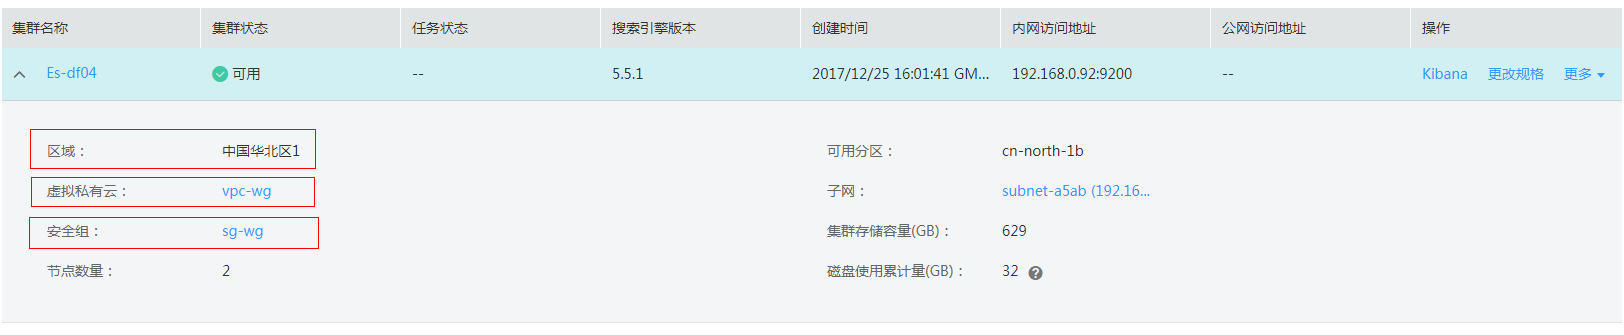 华北区建Elasticsearch集群.png